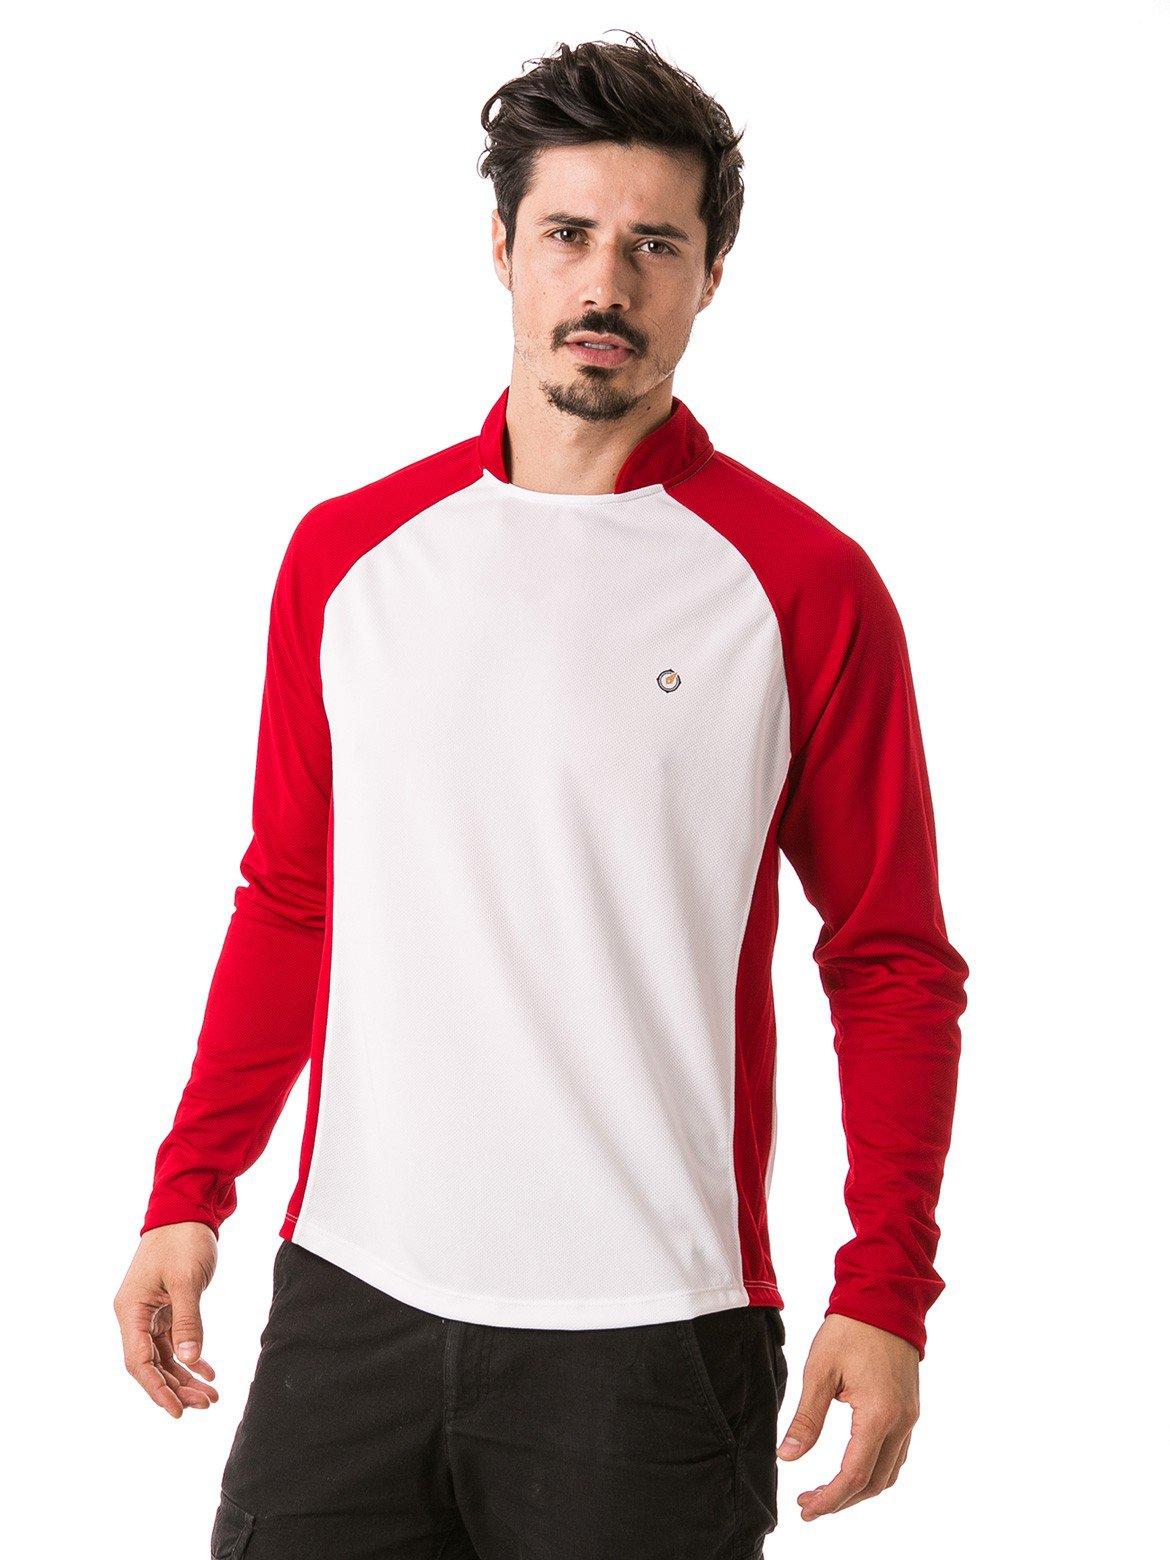 camisa masculina raglan gola alta longa dry manga vermelha frente b